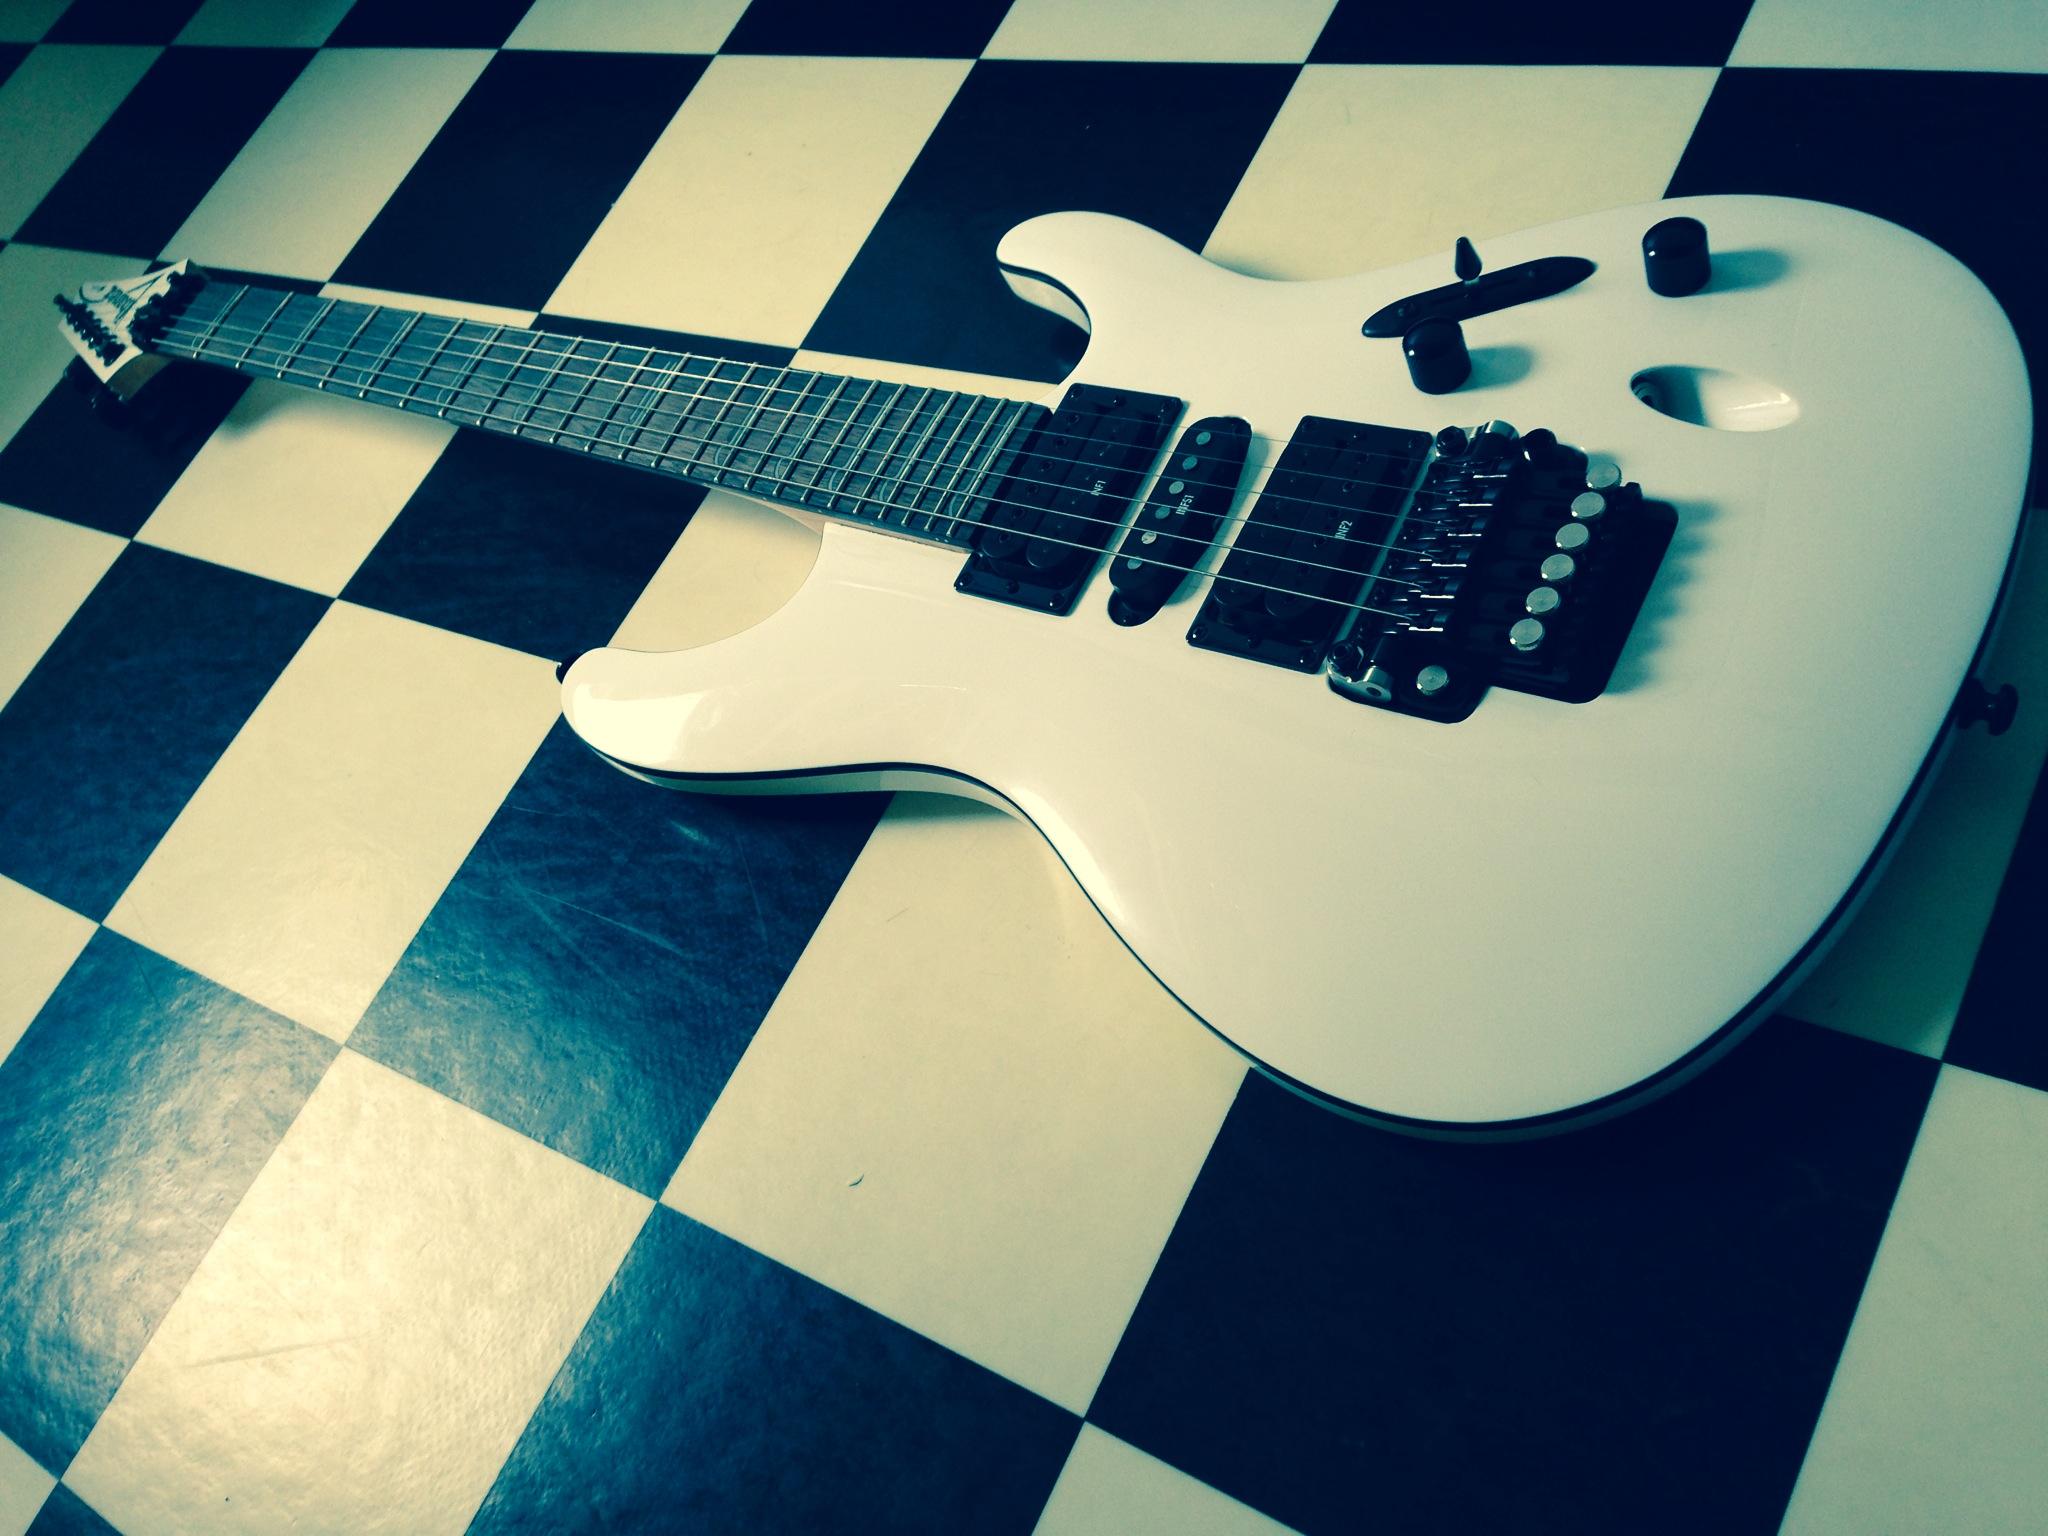 Ibanez-S-series-electric-guitar-white-model-S570B-full-The-Wong-Janice.JPG